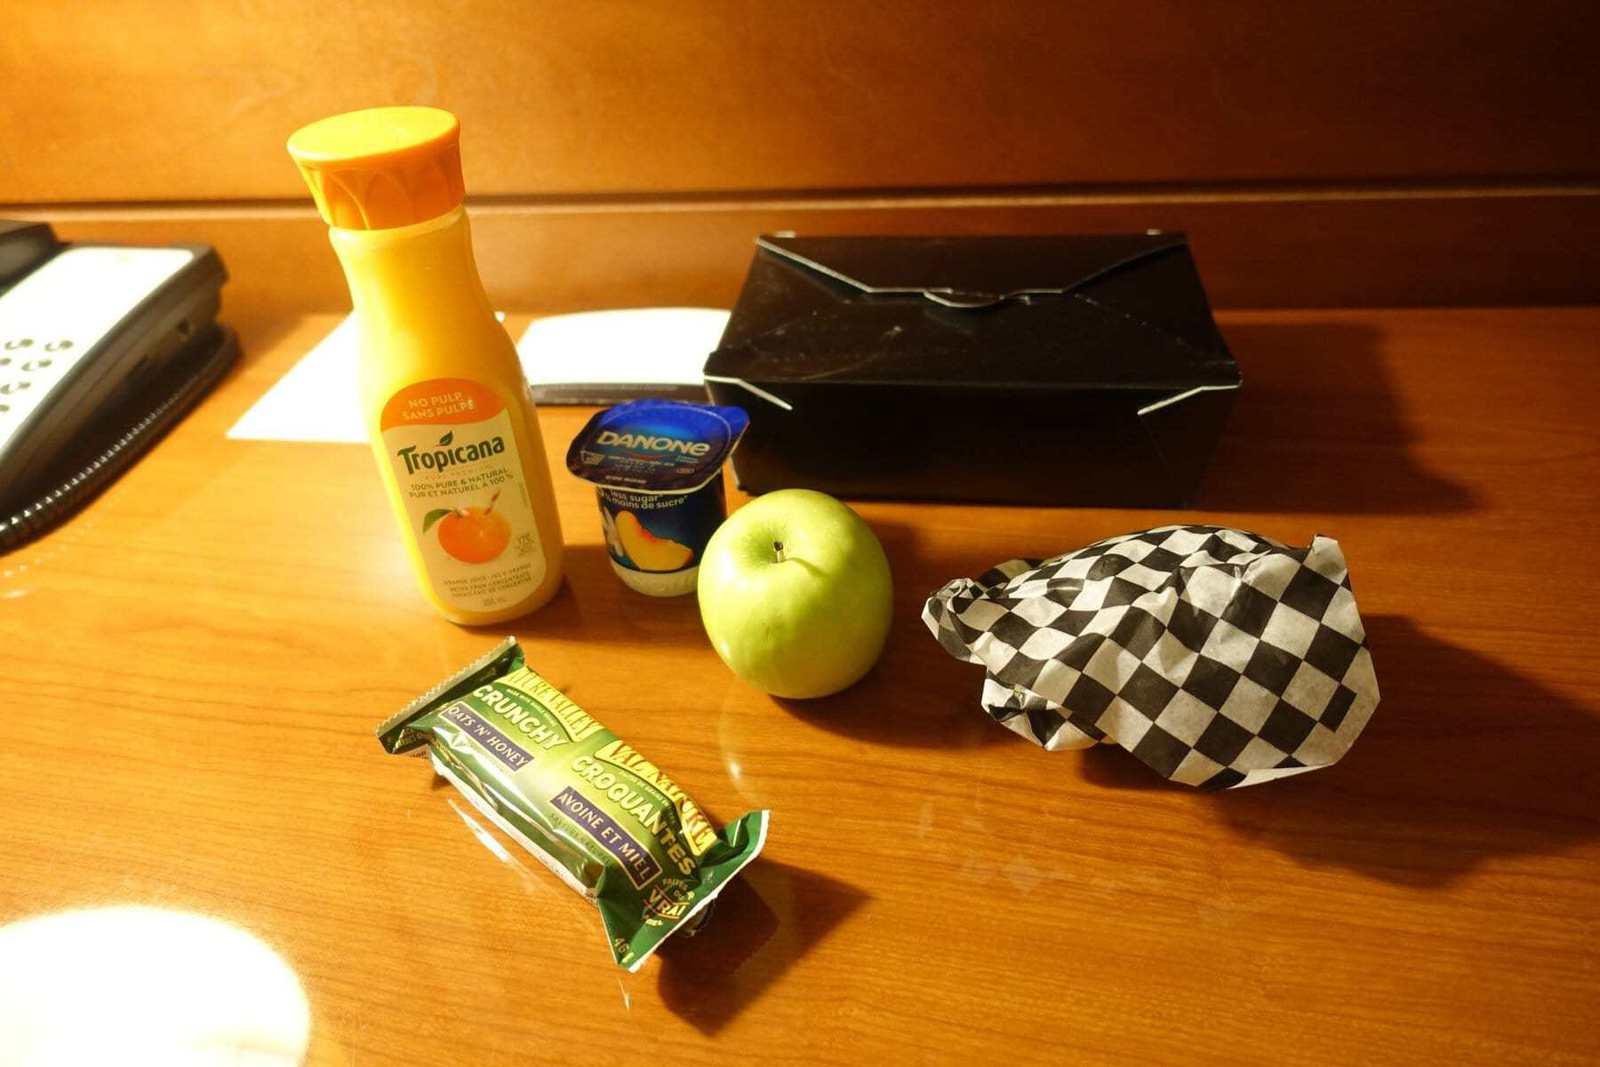 marriott terminal aeroport montreal yul petit déjeuner